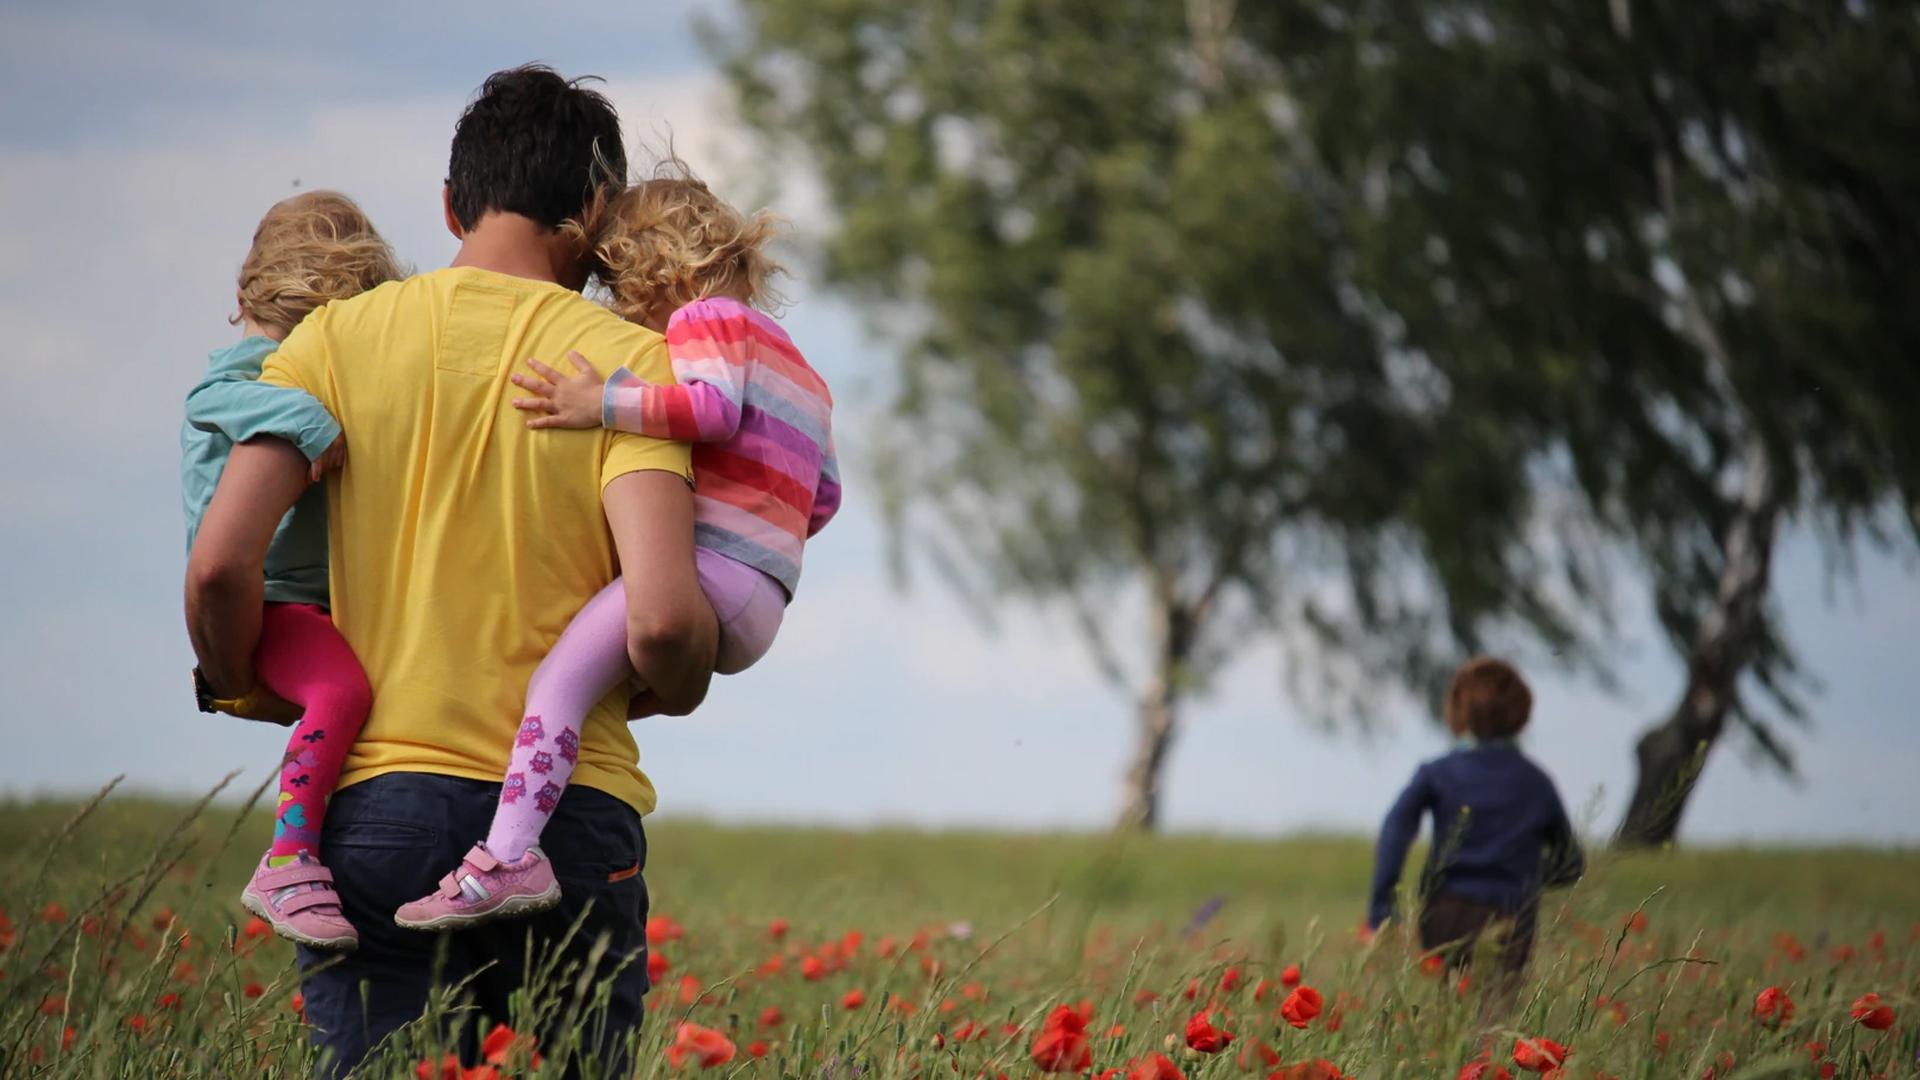 Kathleen Eaton-Bravo | Defeating Planned Parenthood | Steve Brown, Etc.